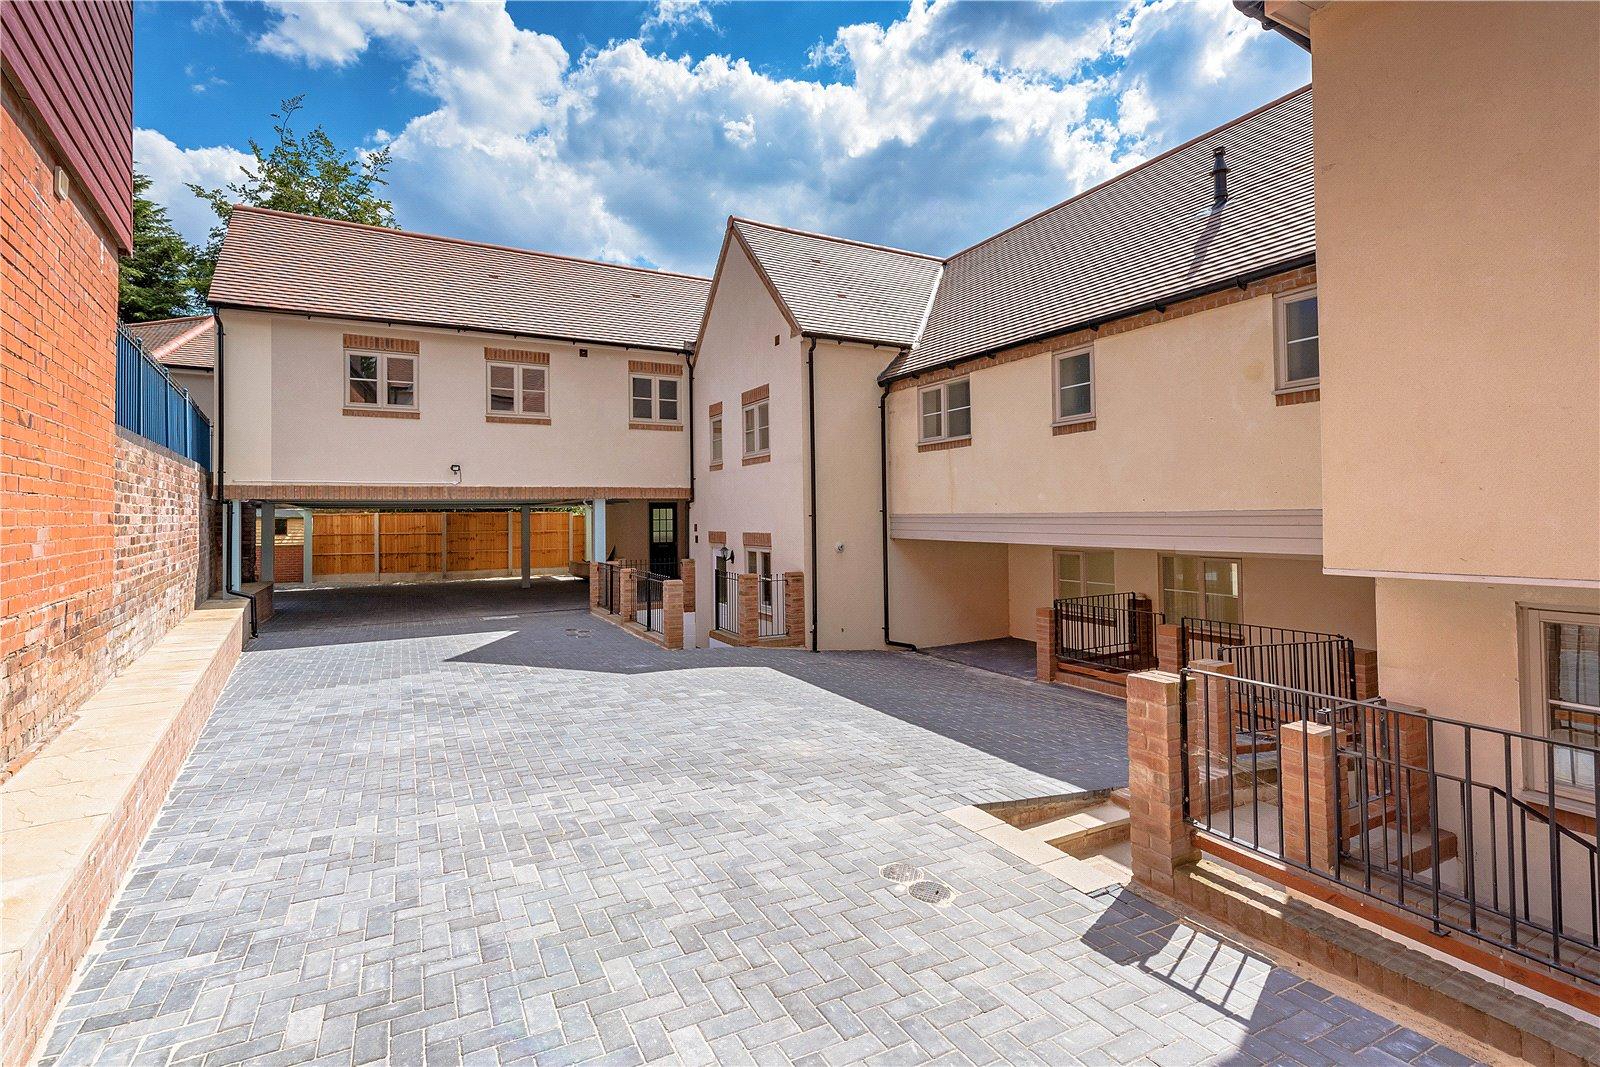 51 Whitburn Street, Bridgnorth, Shropshire, WV16